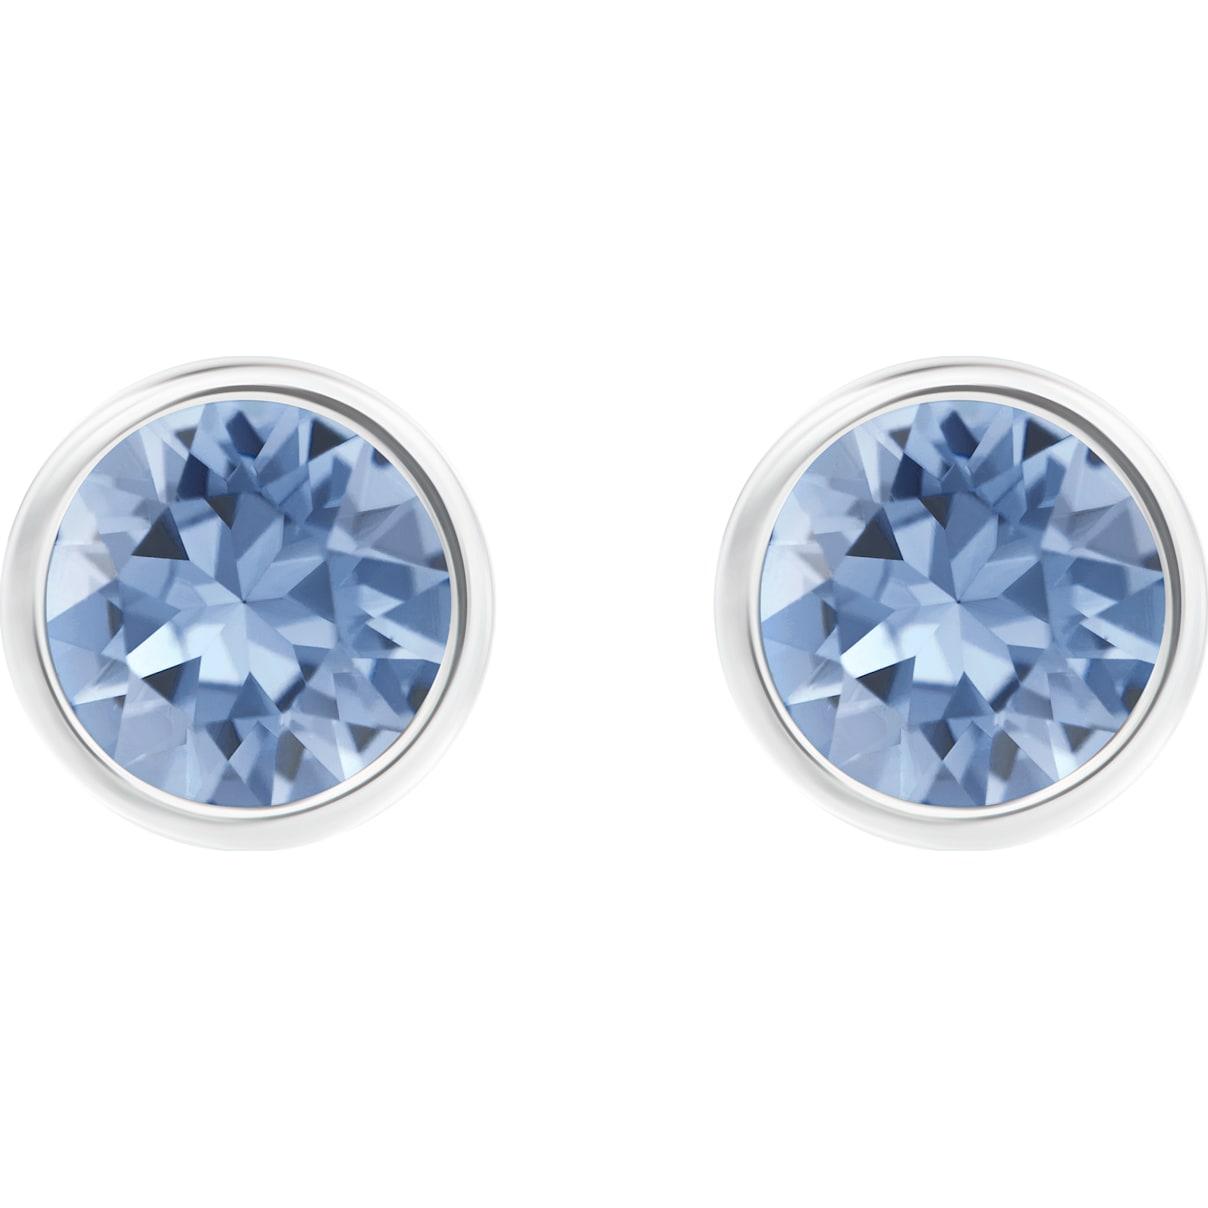 Swarovski Solitaire Pierced Earrings, Blue, Rhodium plated